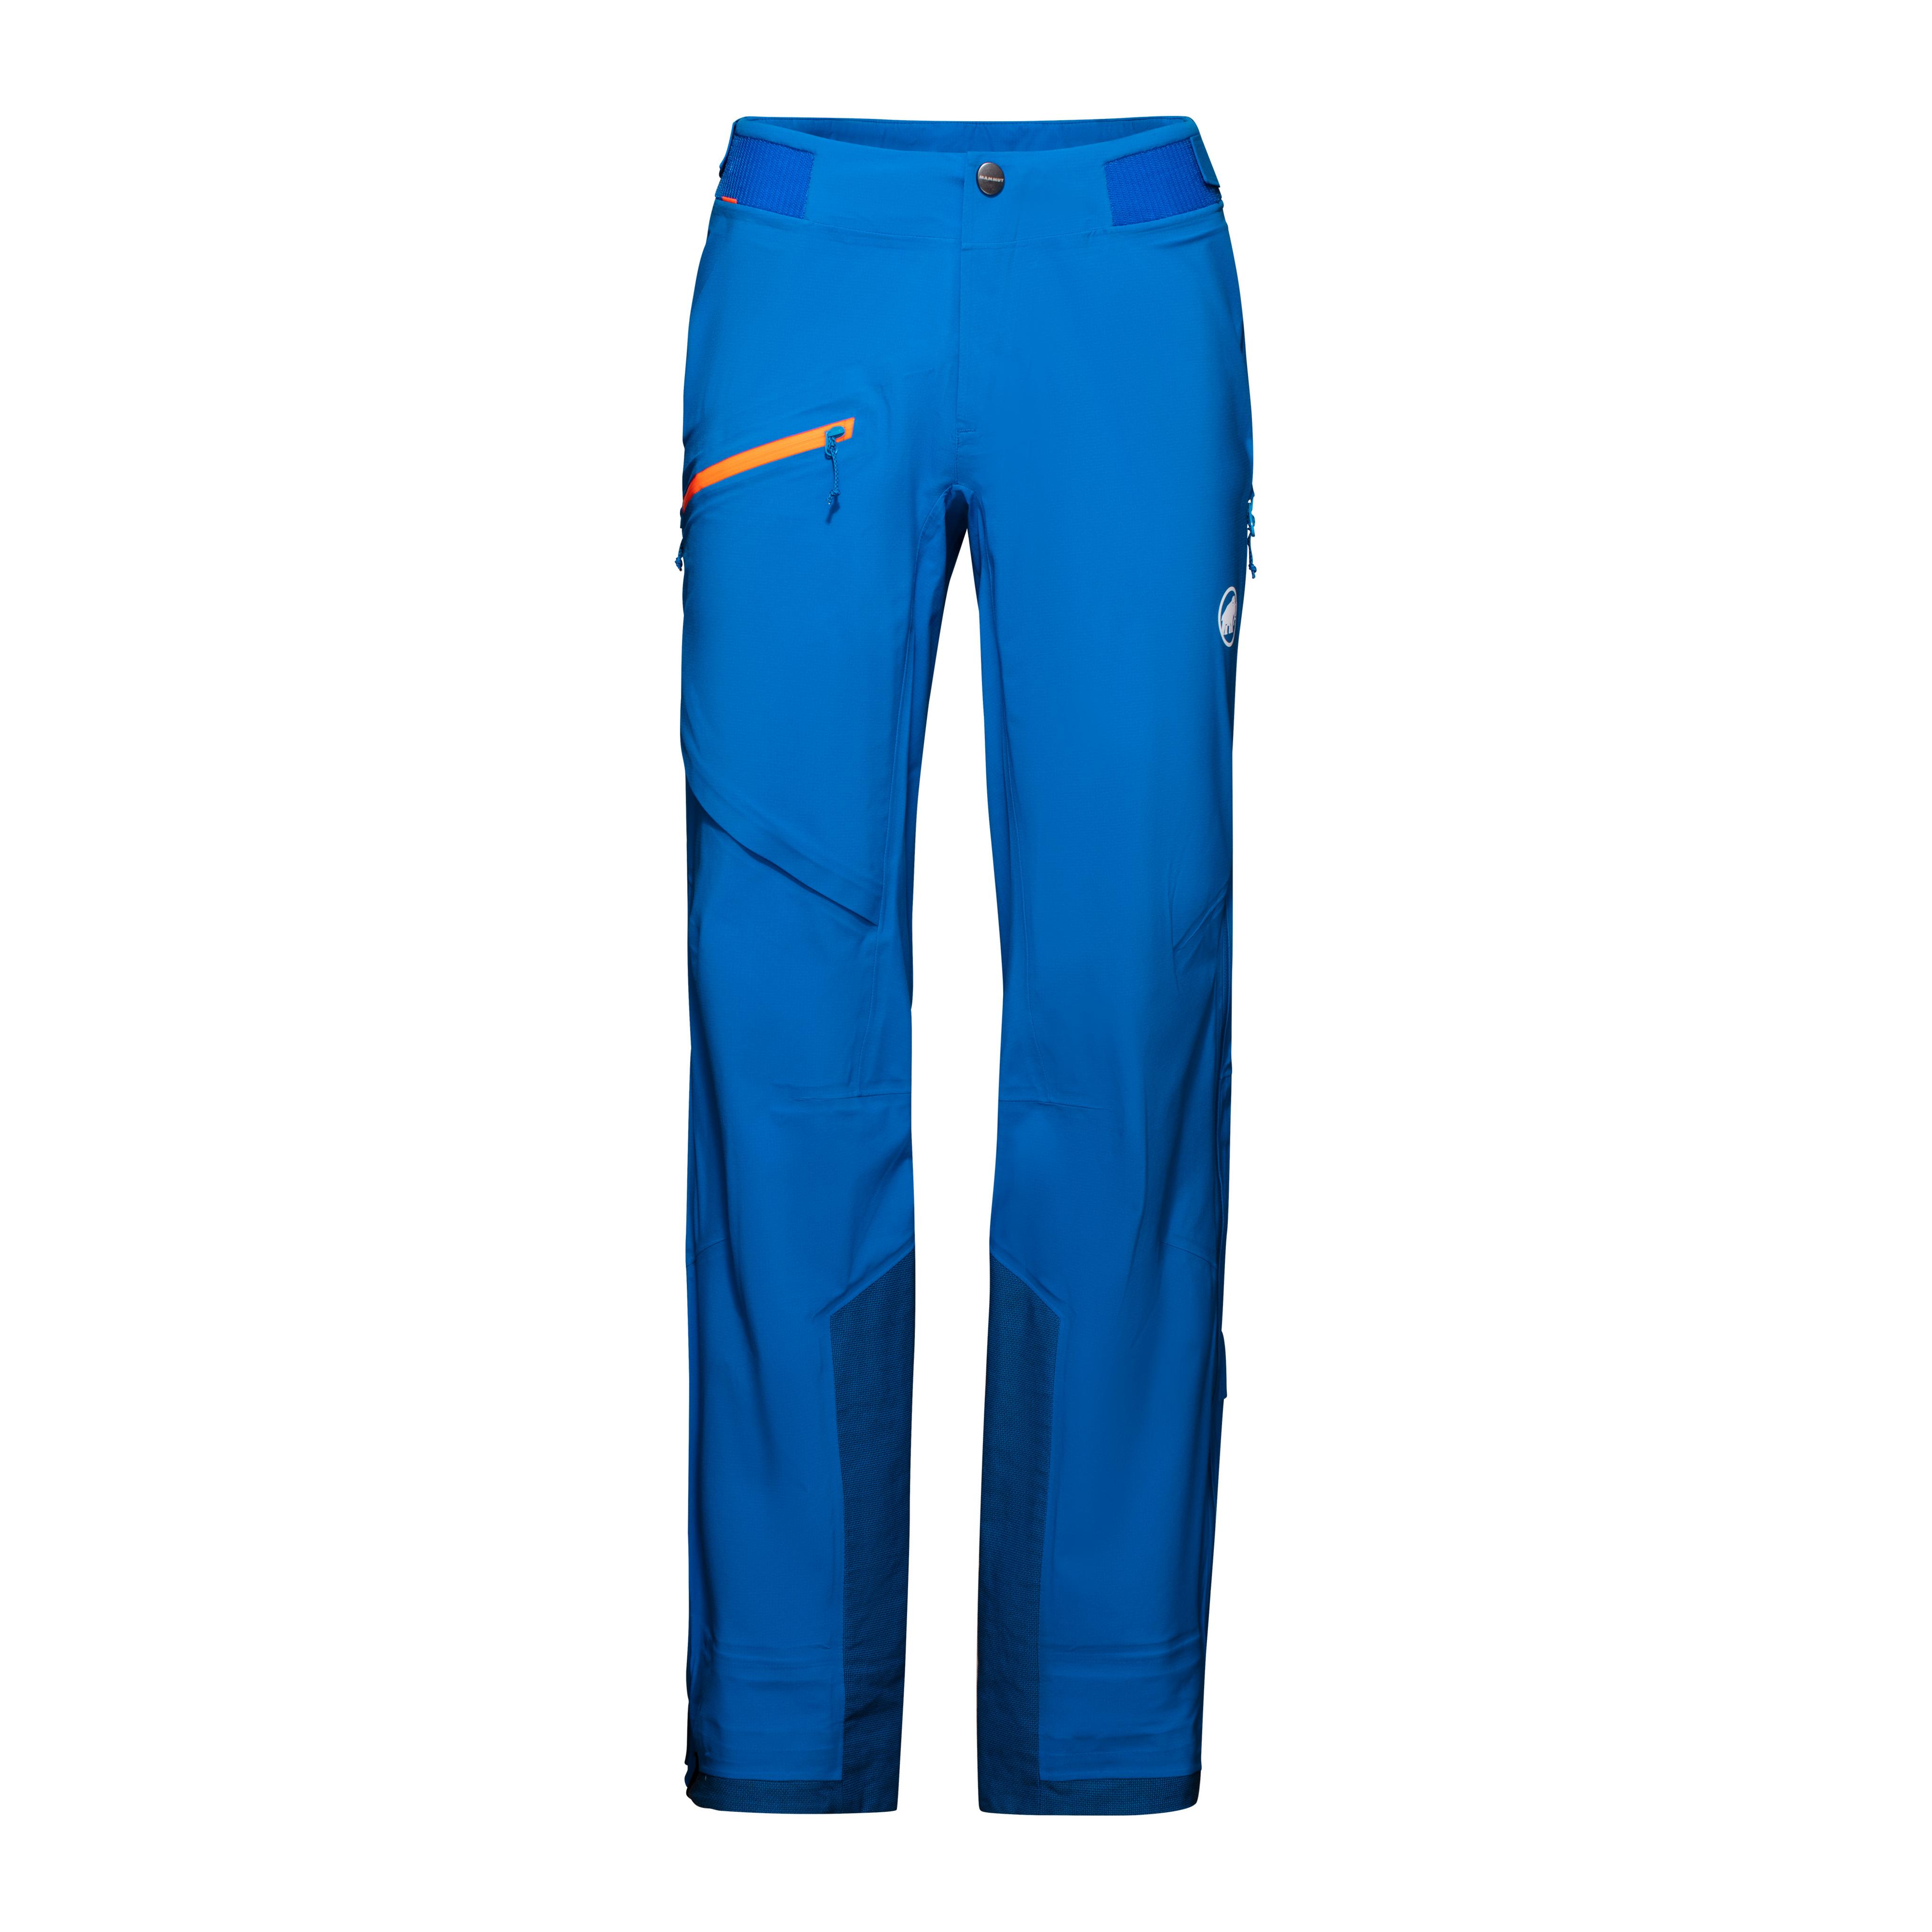 Aenergy Air HS Pants Men - ice, normal, UK 36 thumbnail